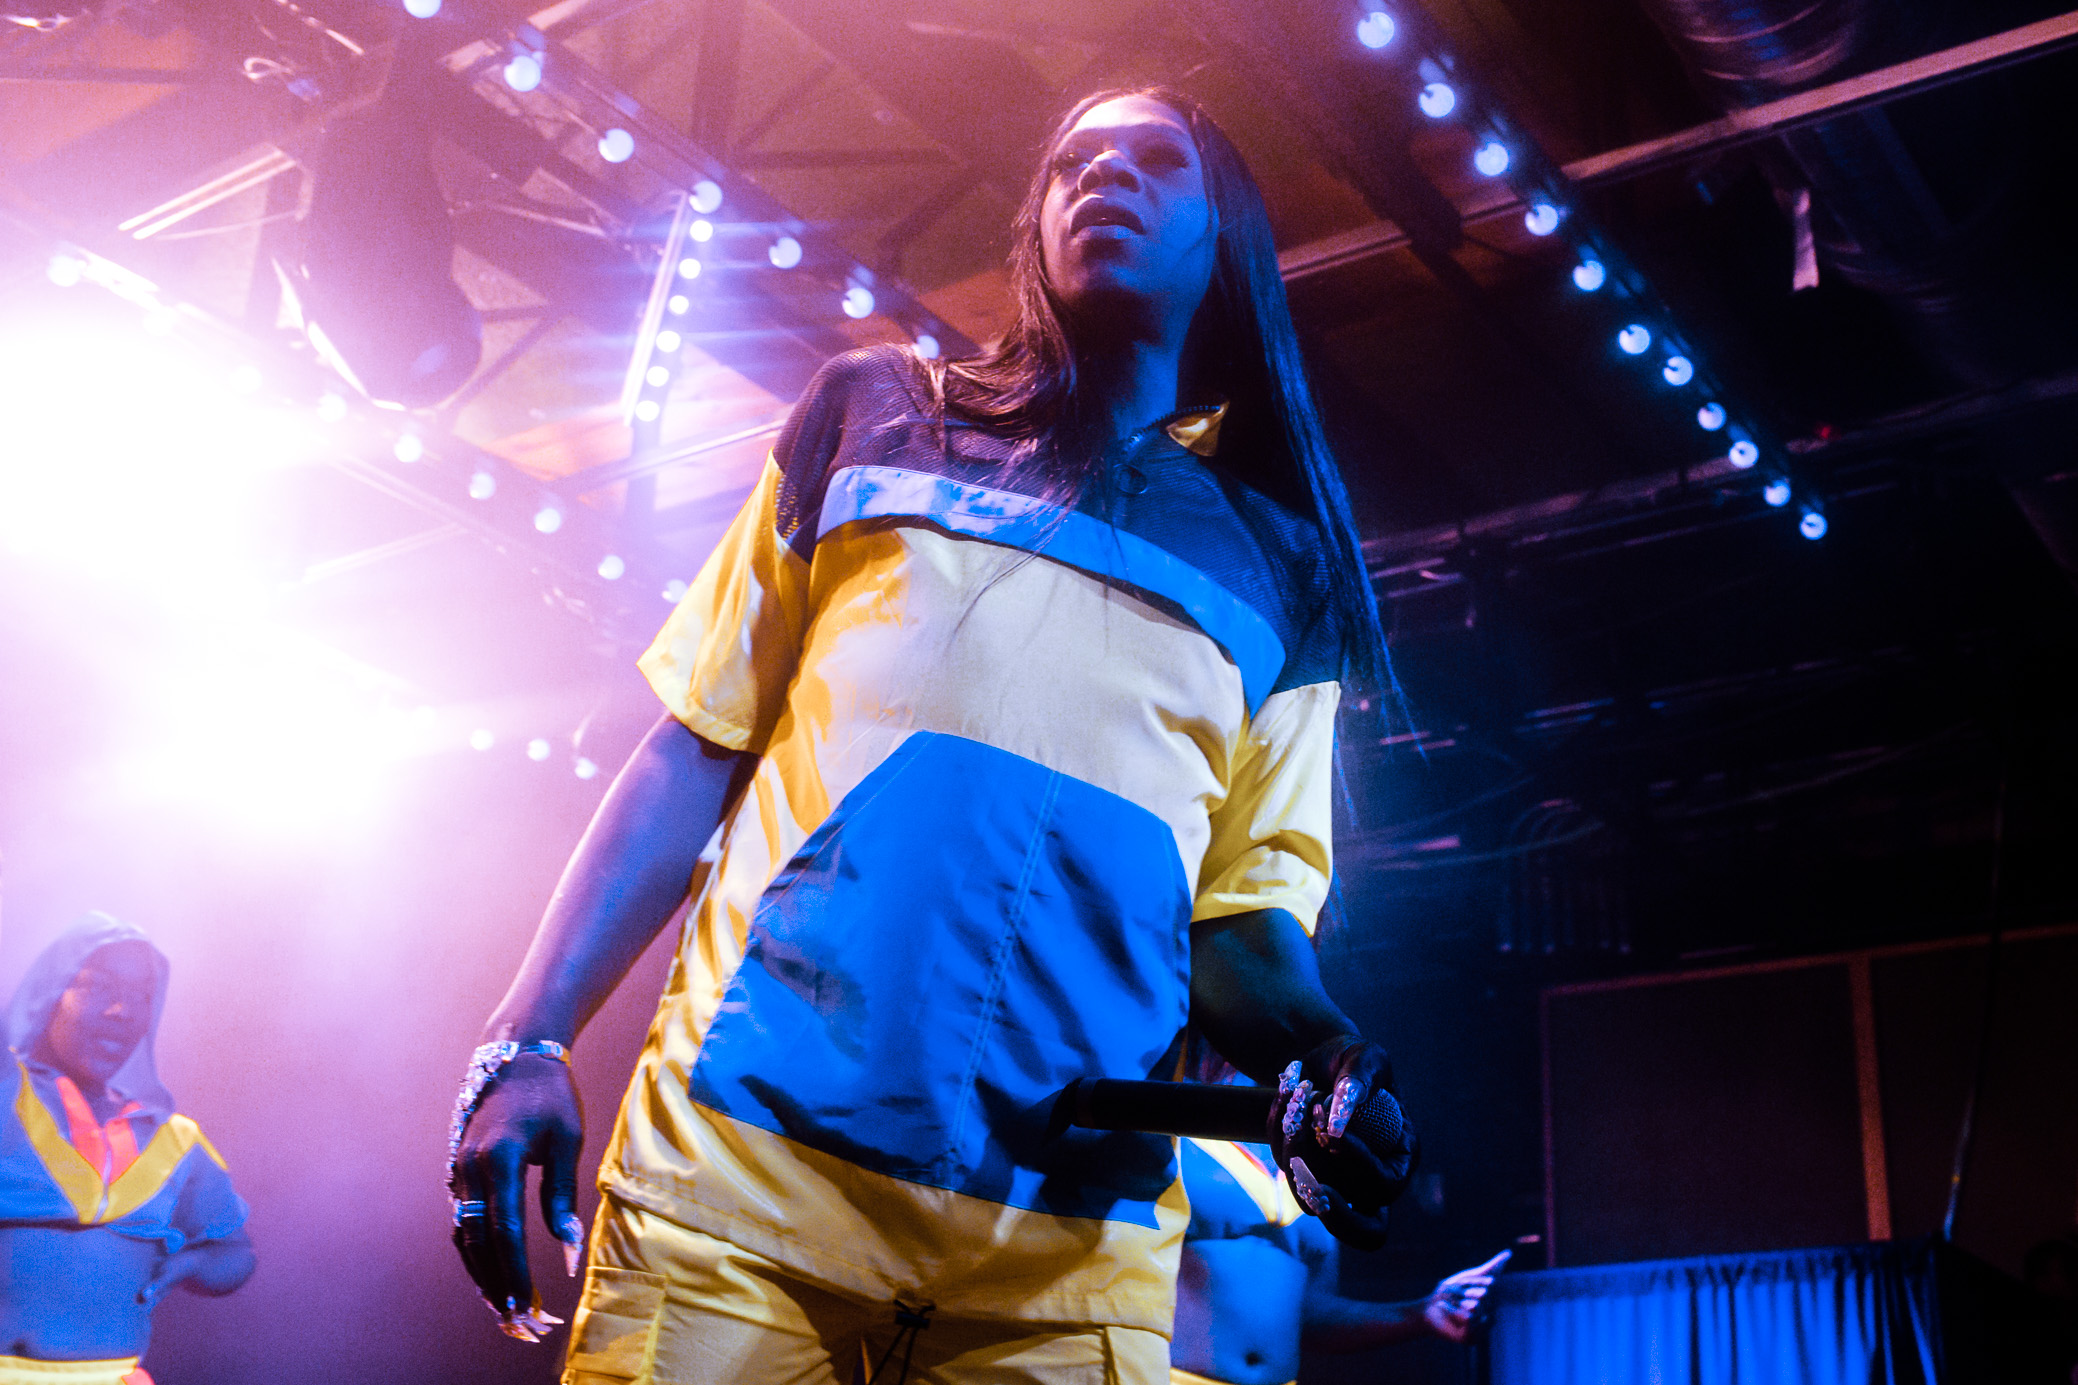 Big Freedia performs in concert at Saturn Birmingham in Birmingham, Alabama on May 12th, 2019. (Photo by David A. Smith / DSmithScenes)